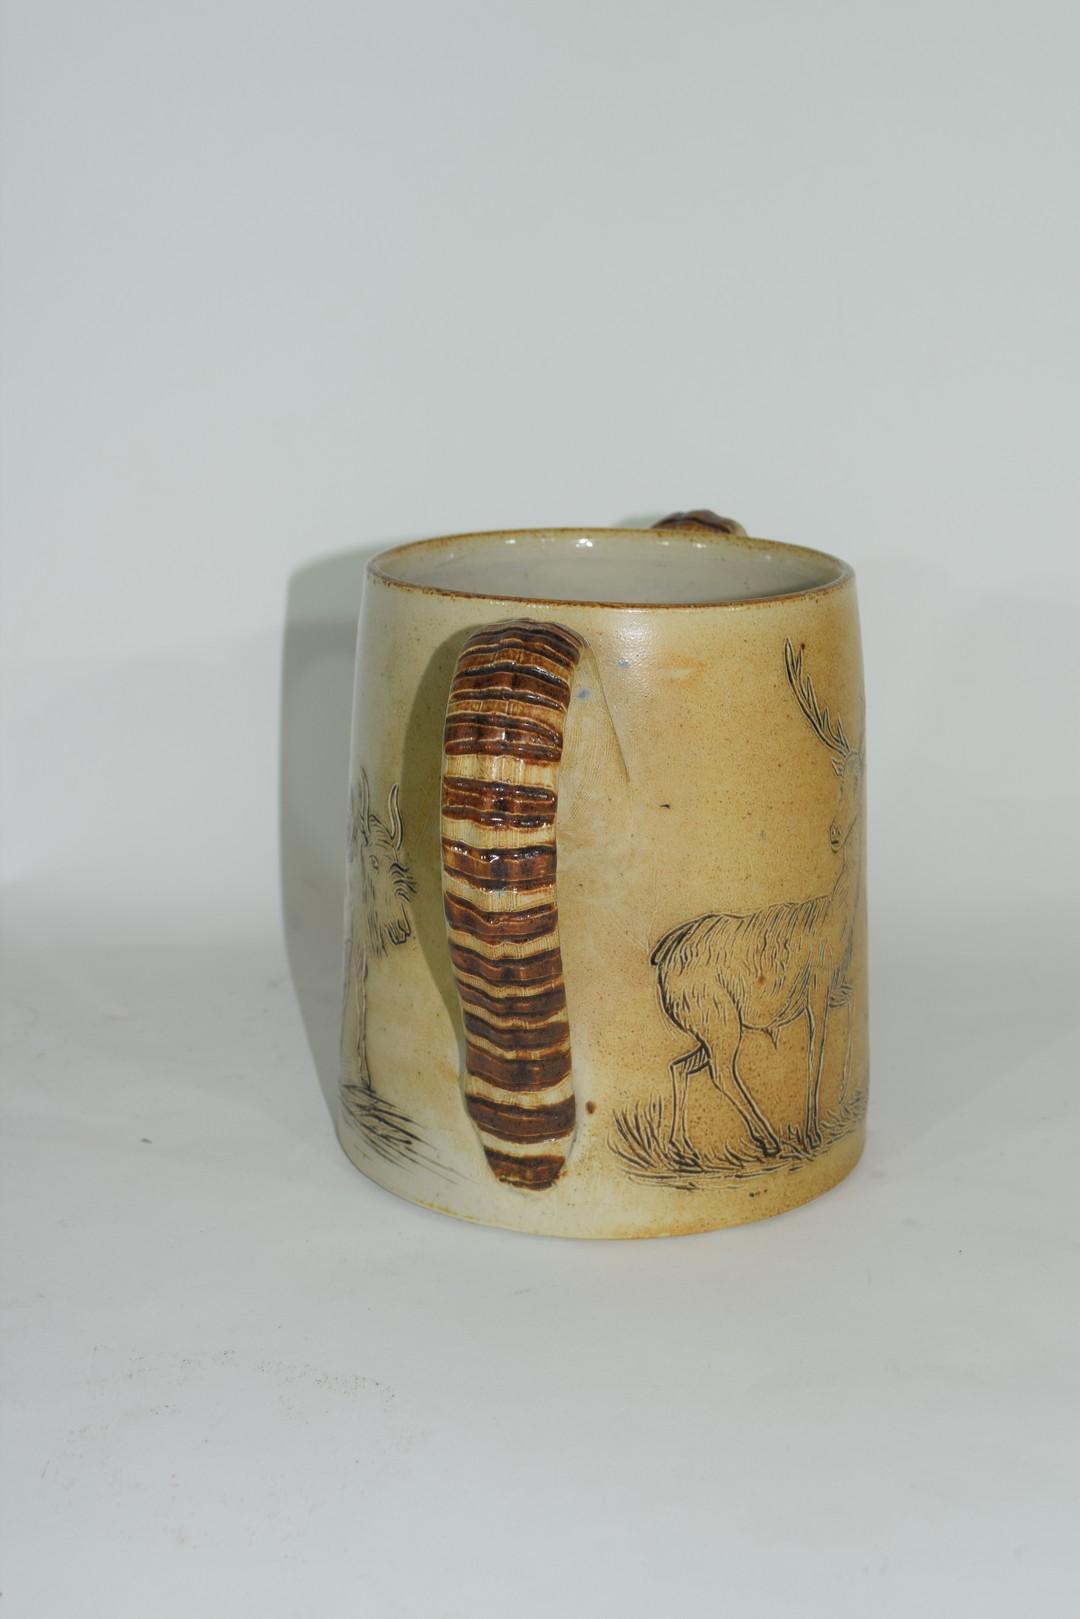 Smith & Co salt glazed two handled mug or tyg - Image 4 of 6